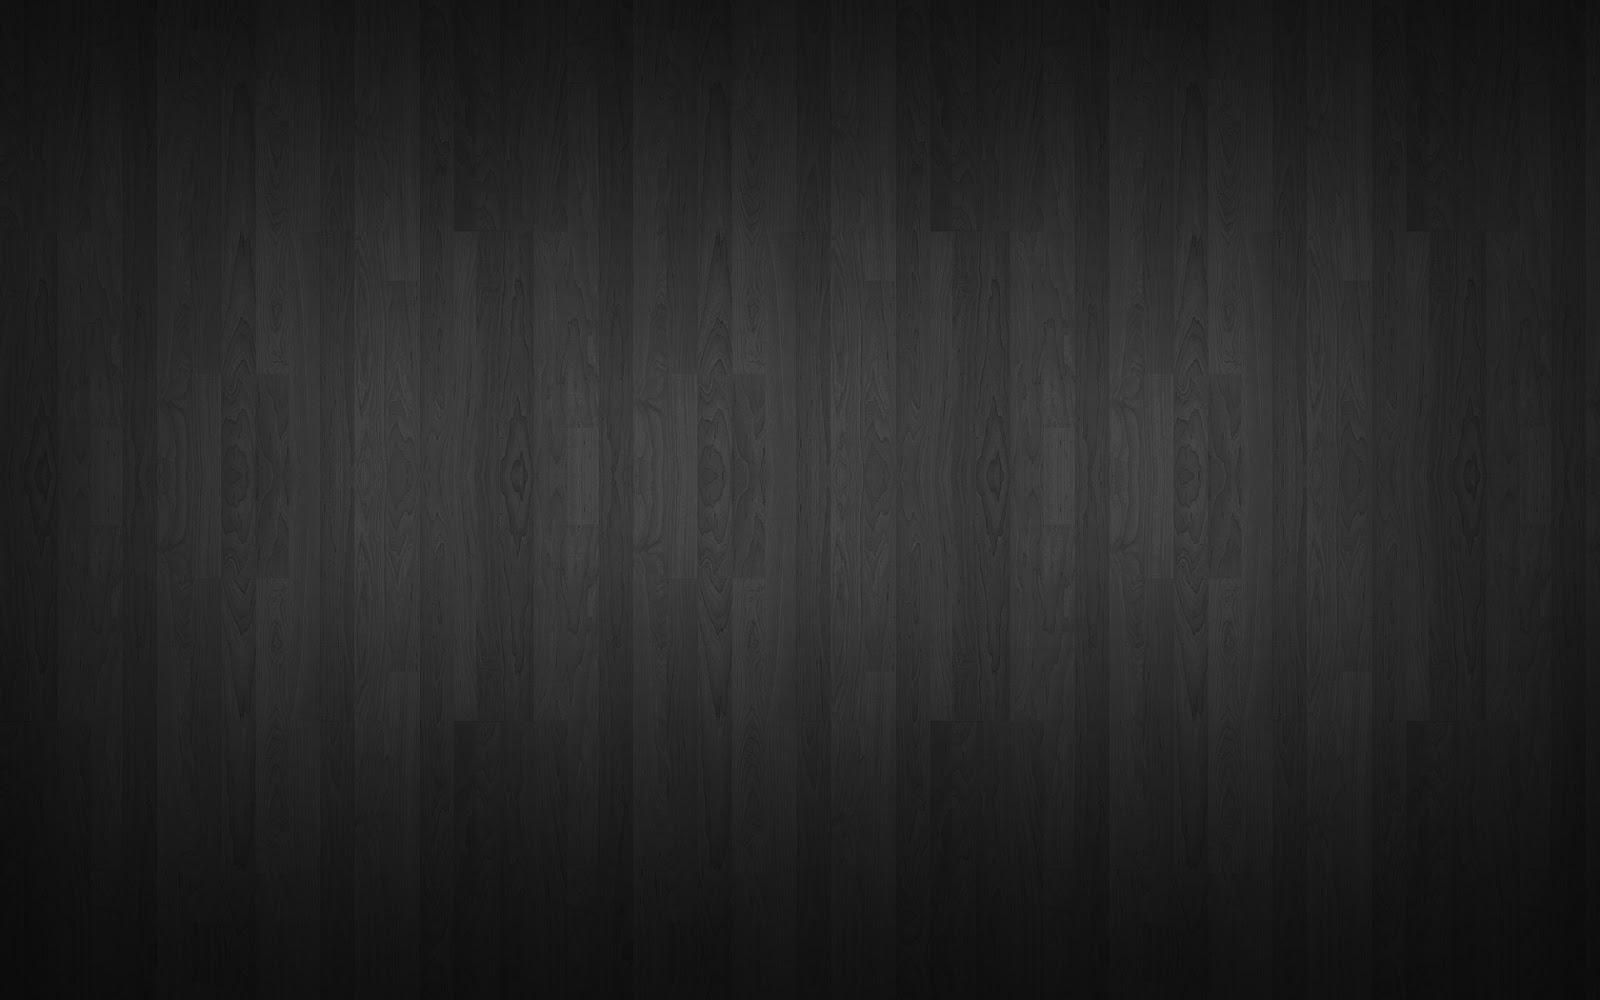 Black Wallpaper: Cool Black Wallpapers